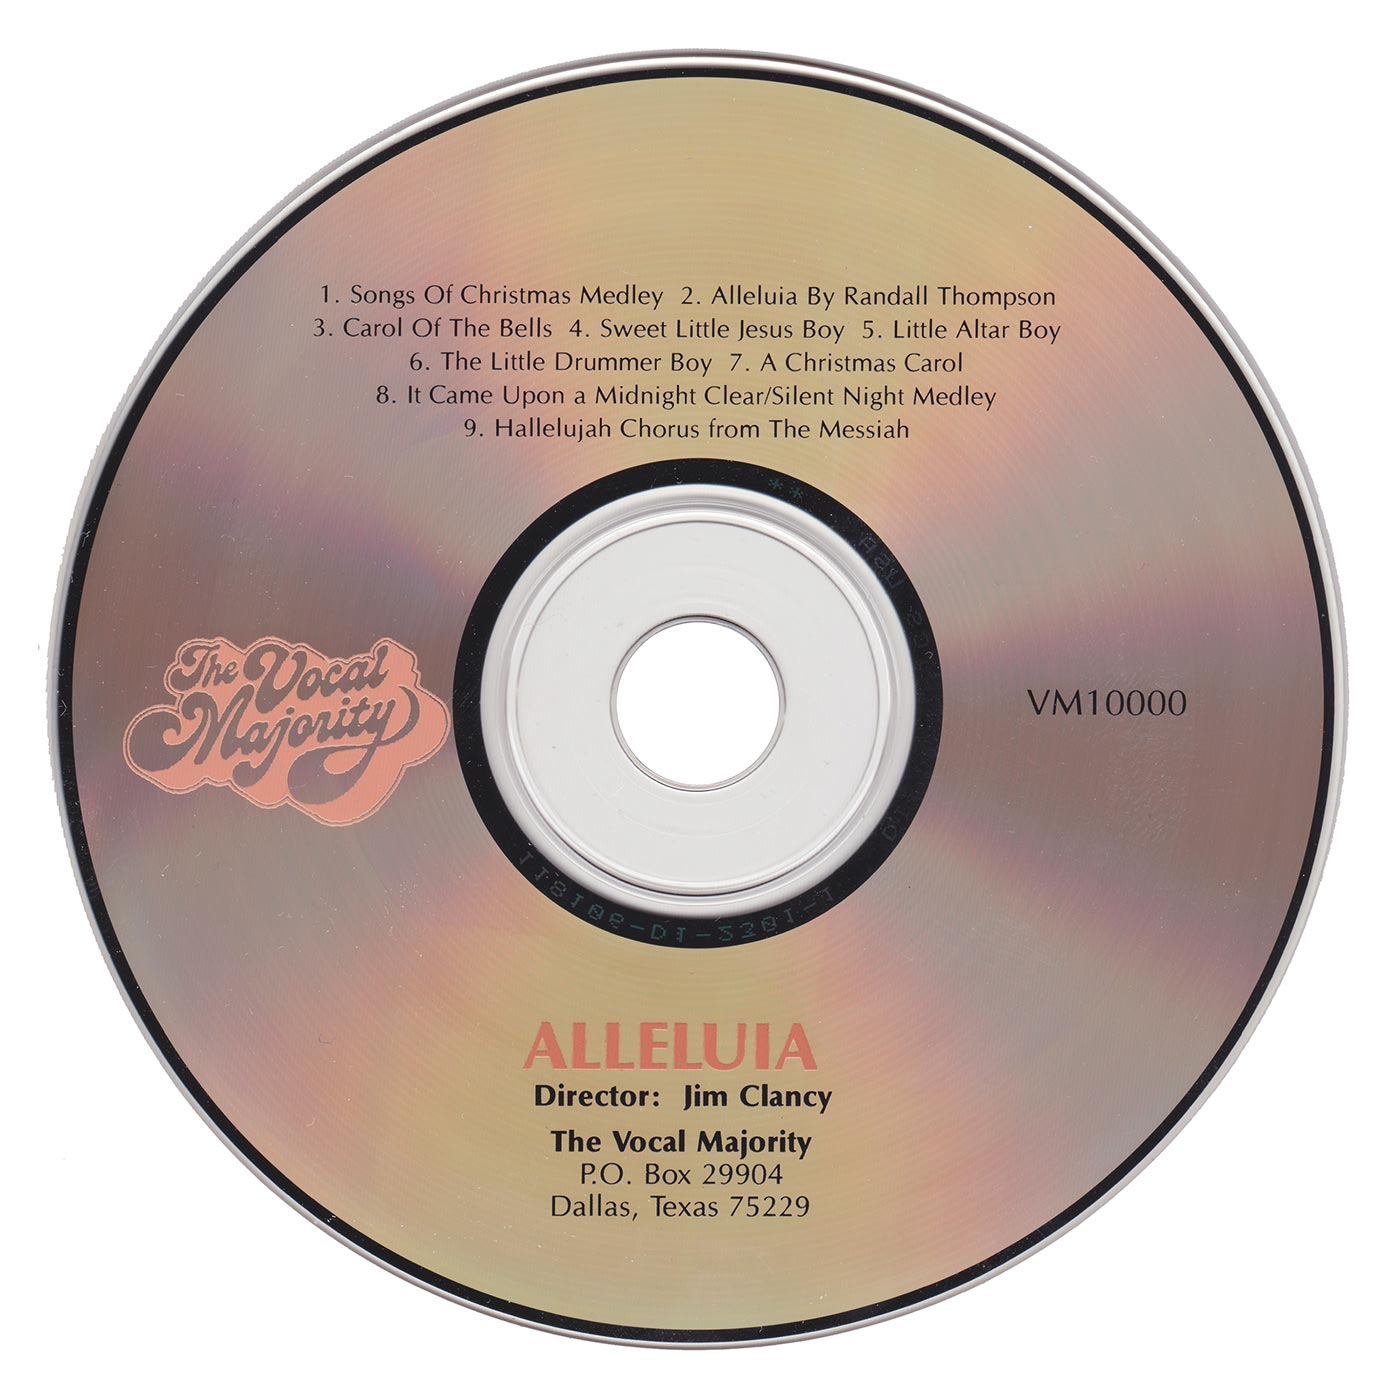 Disc Art: Alleluia